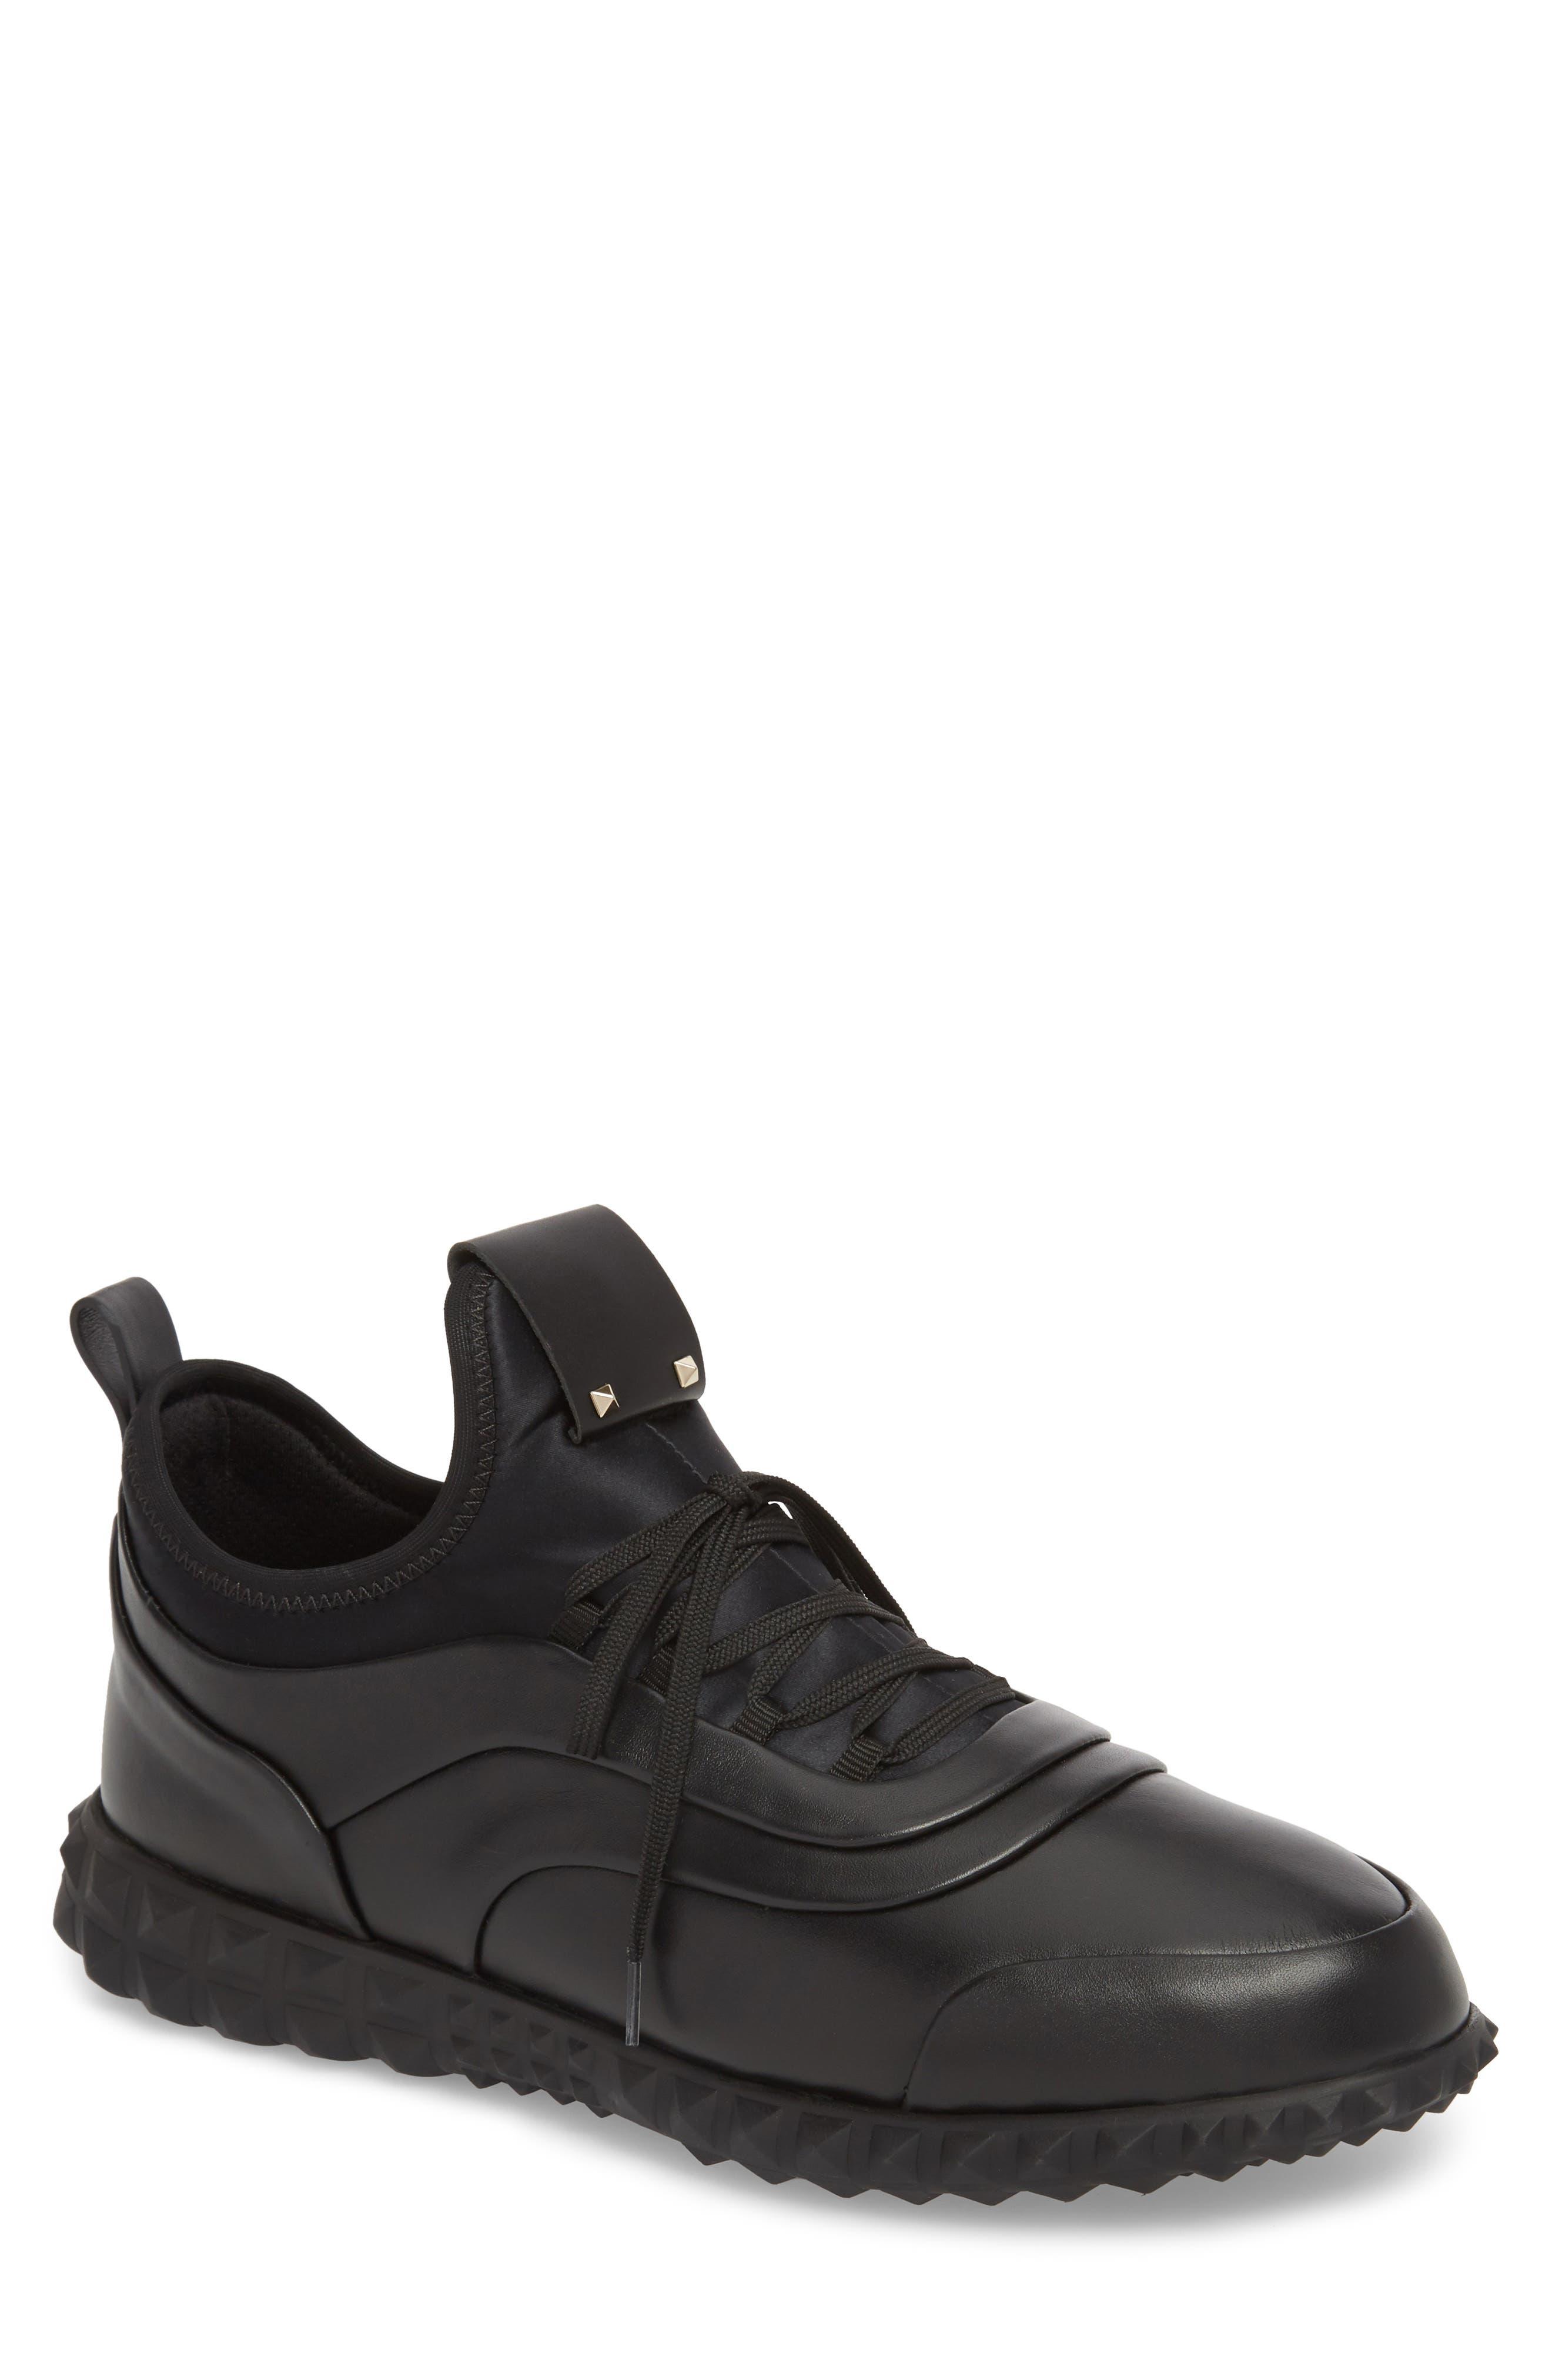 Bodytech Sneaker,                         Main,                         color, Black/ Black